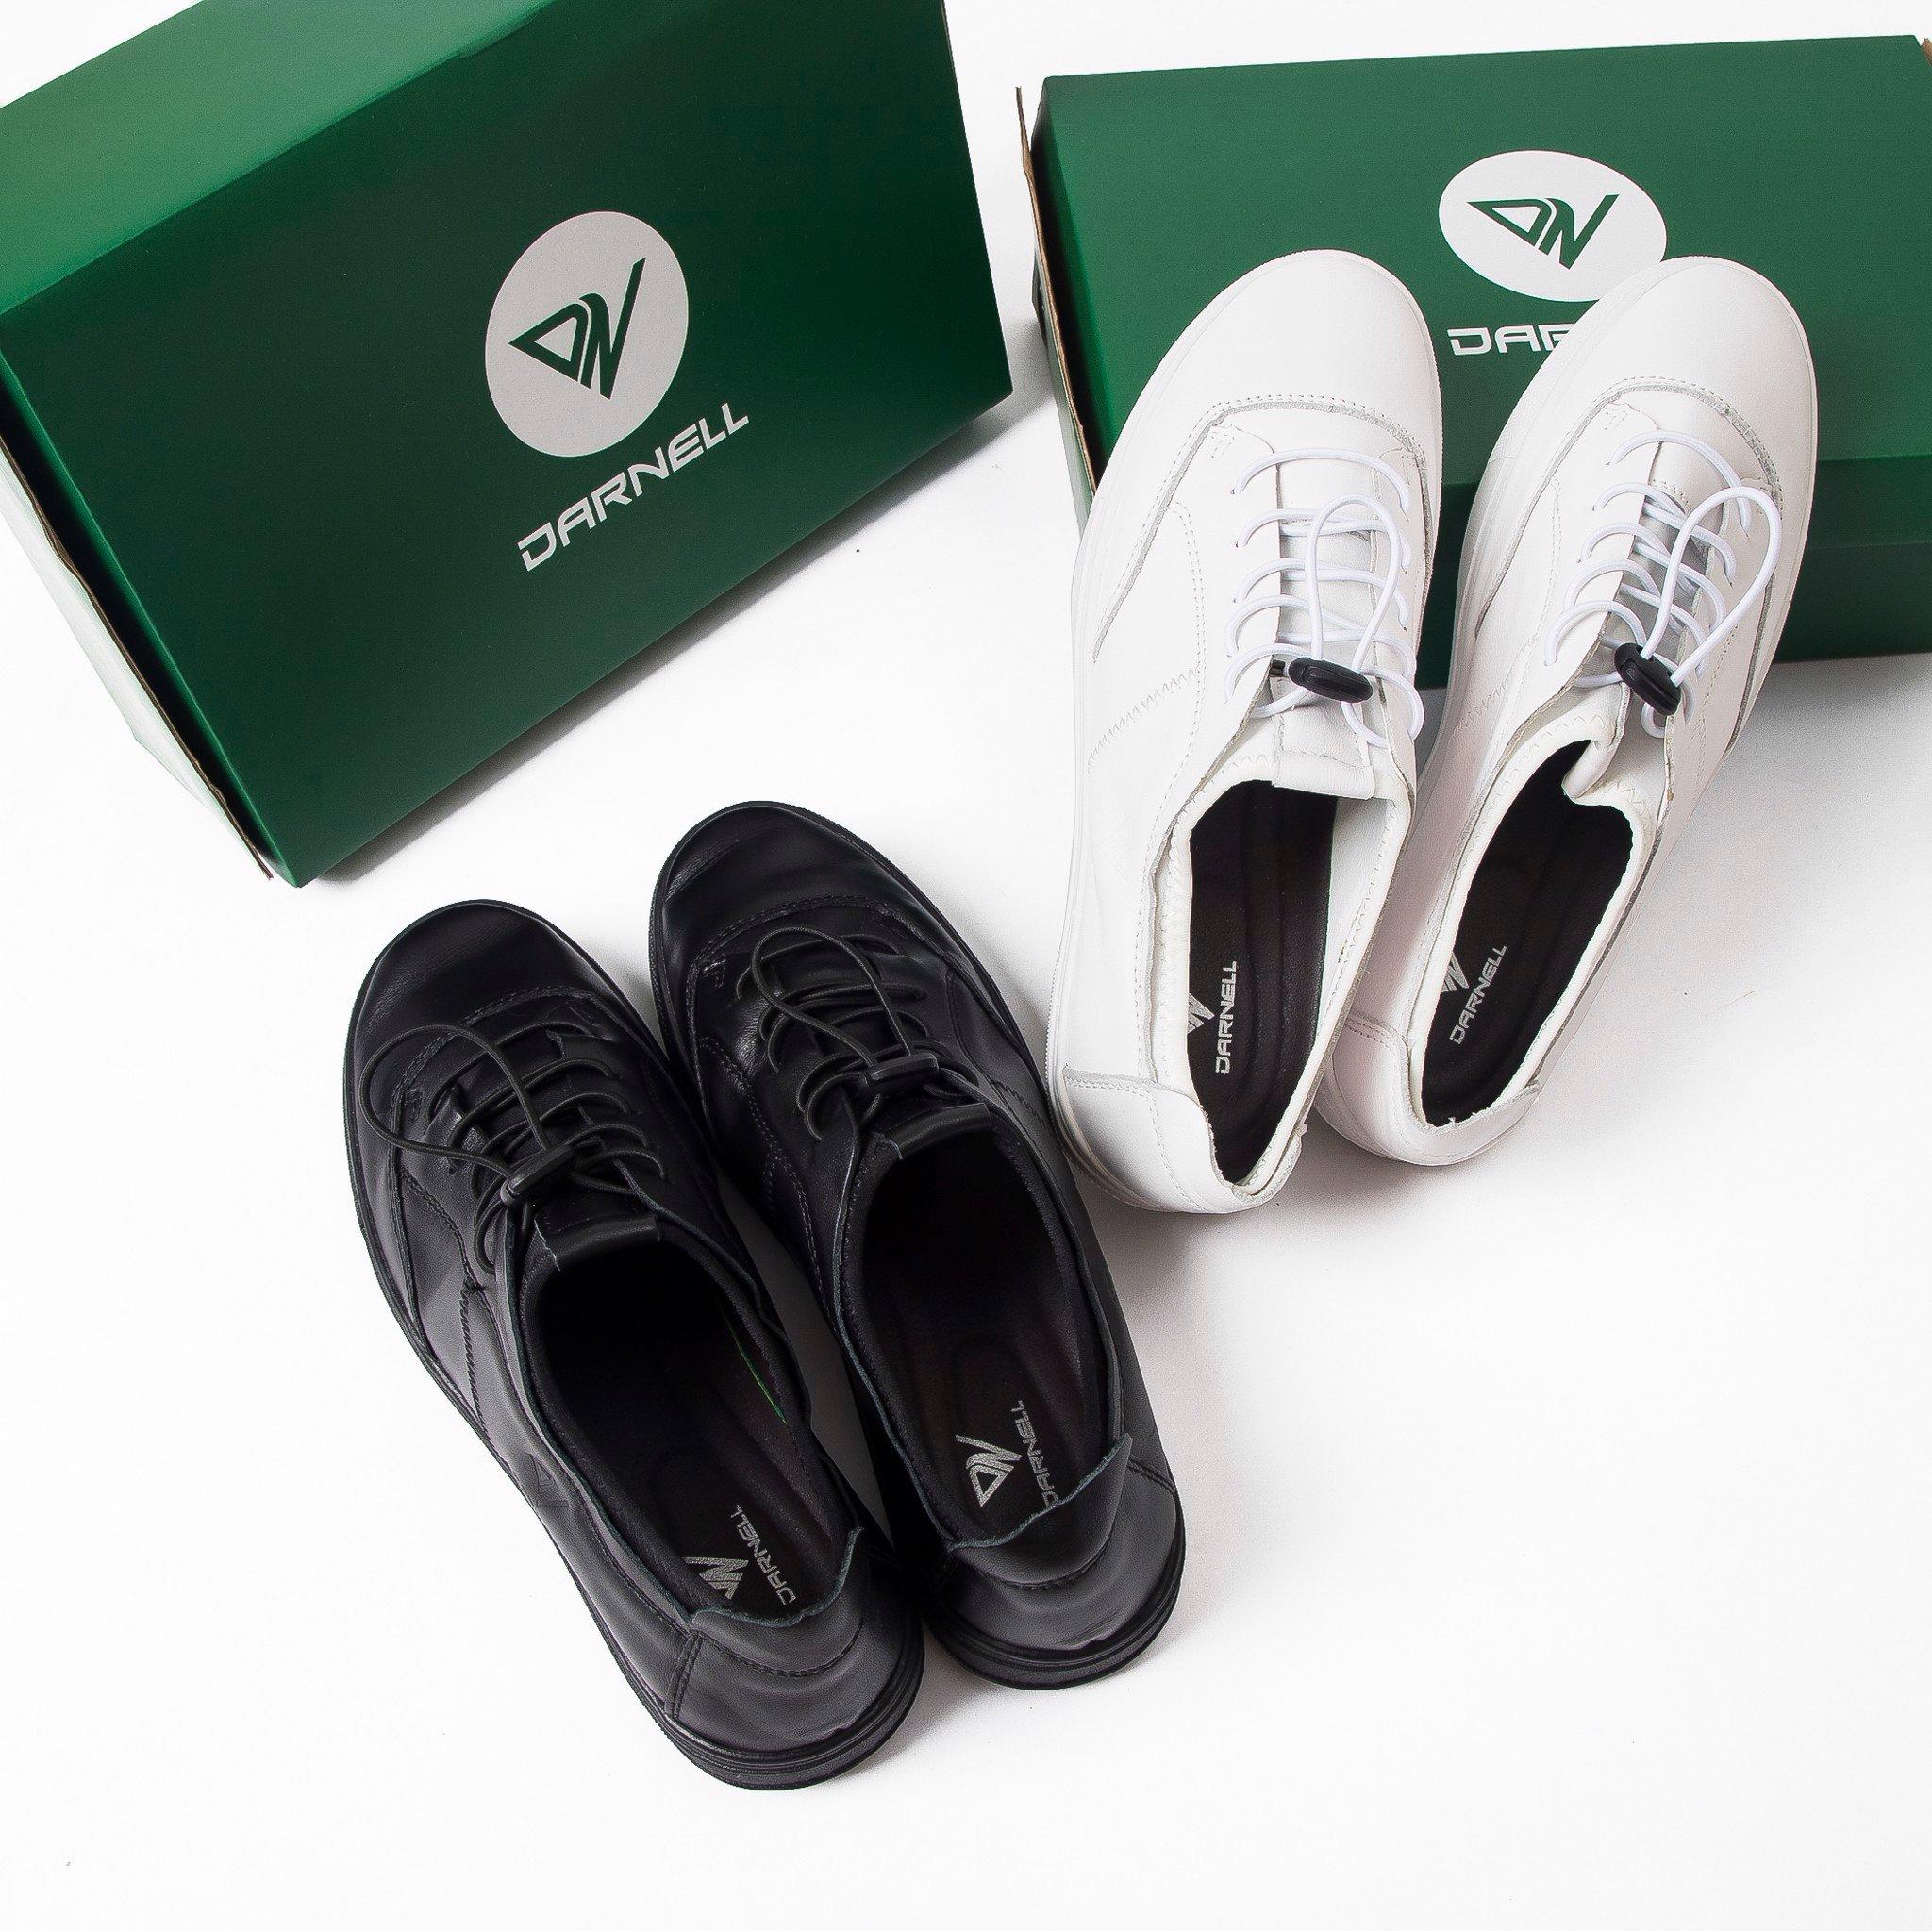 Giày Sneaker Darnell khóa rút - DN413